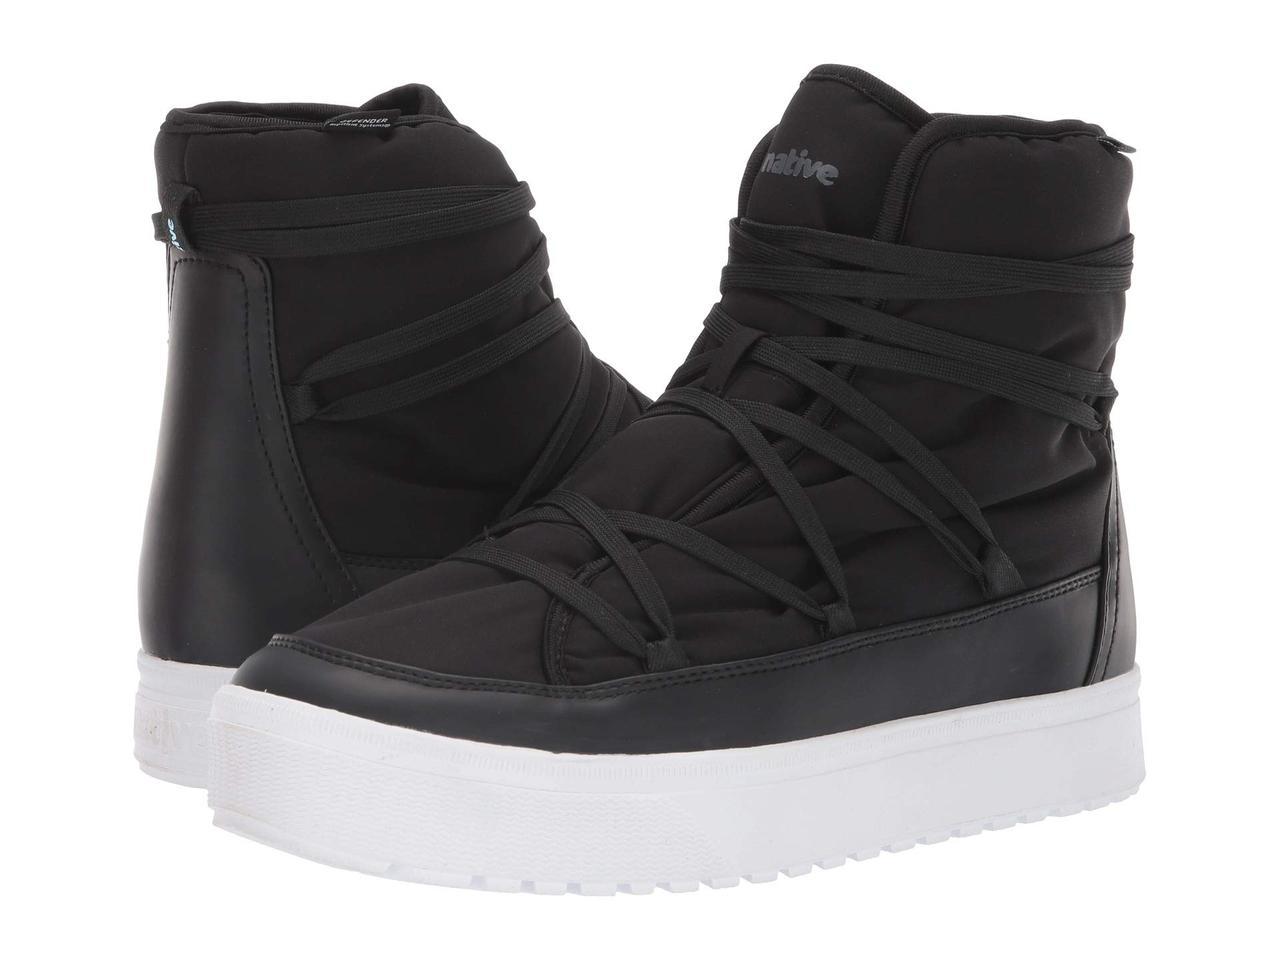 92713ff85709 Кроссовки/Кеды (Оригинал) Native Shoes Chamonix Jiffy Black/Shell White:  продажа, цена в Киеве. ...